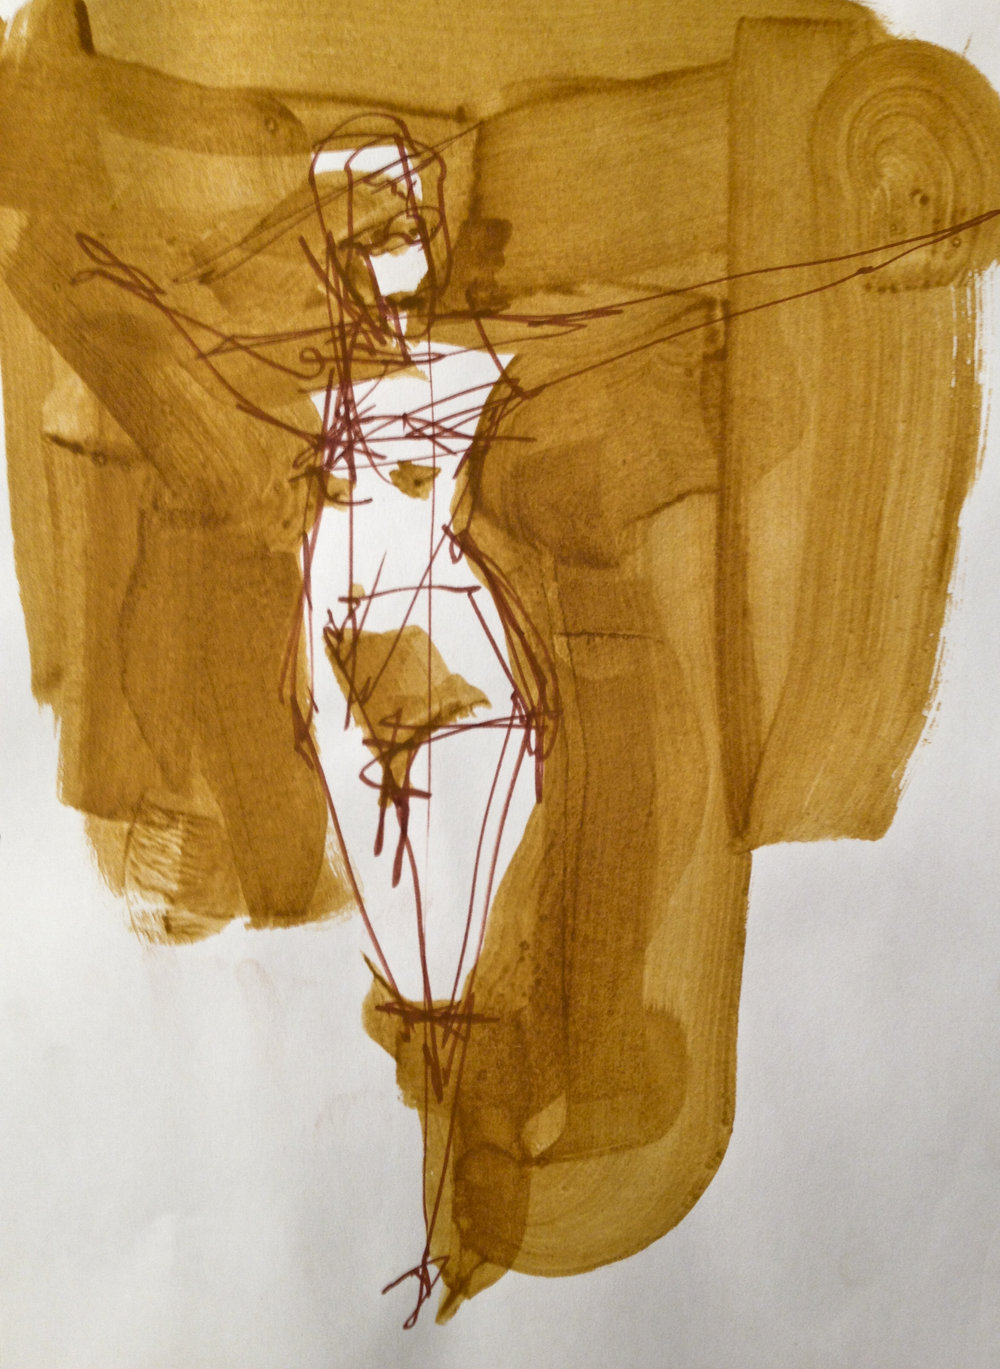 langley nude notan 10x8 ink wash.jpg